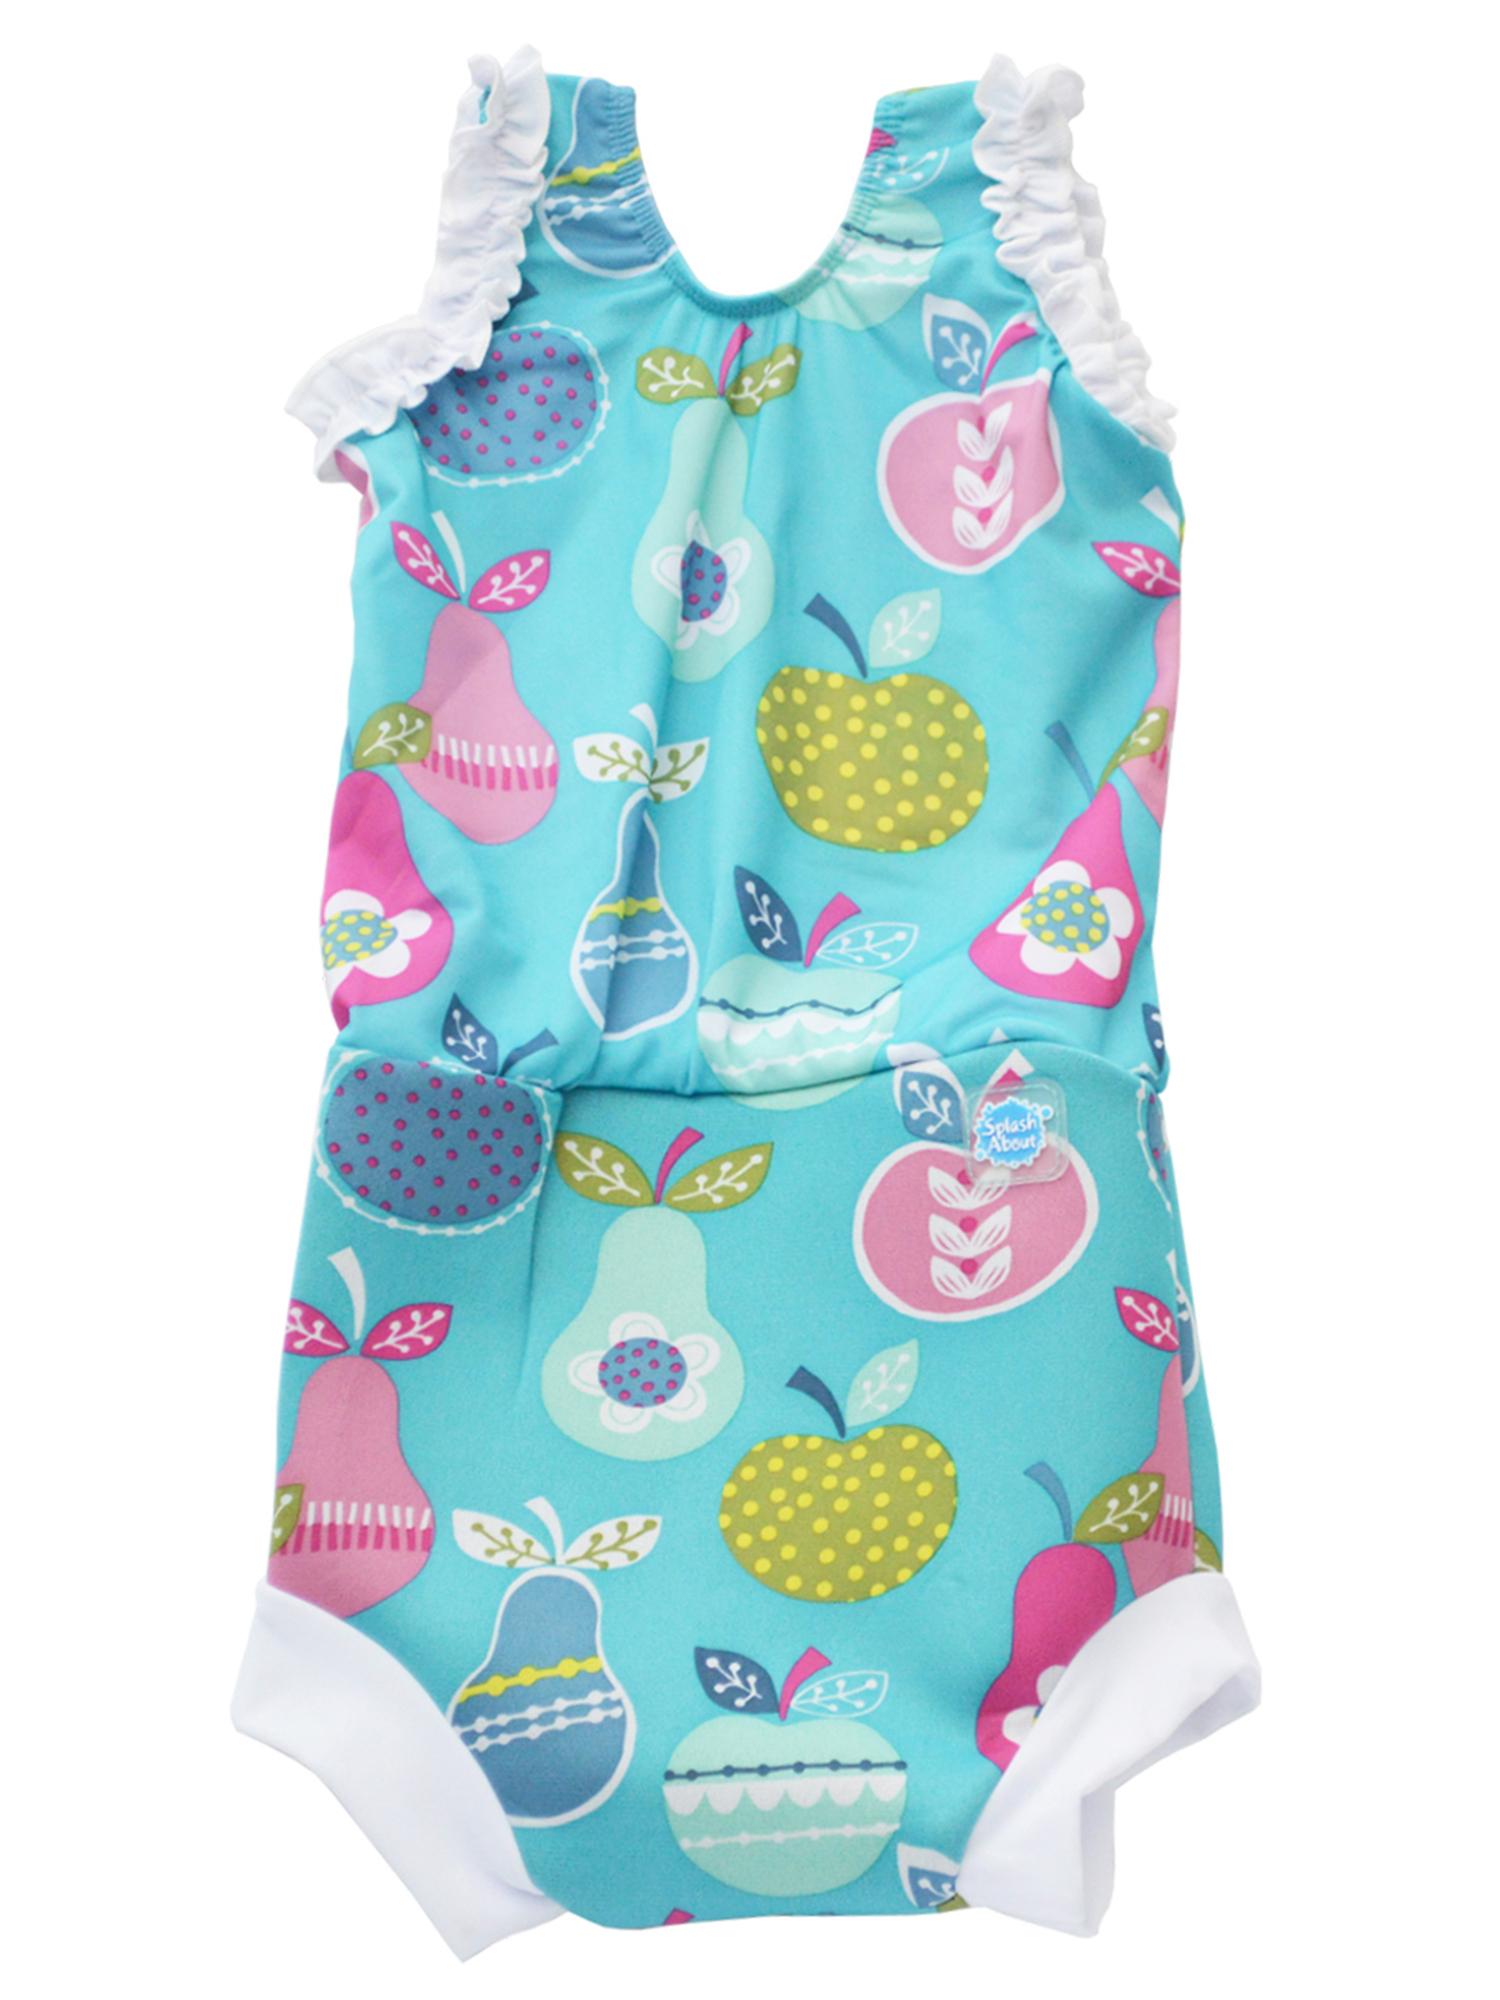 Happy Nappy Diaper Swimsuit Tutti Frutti Large 6-14 Months